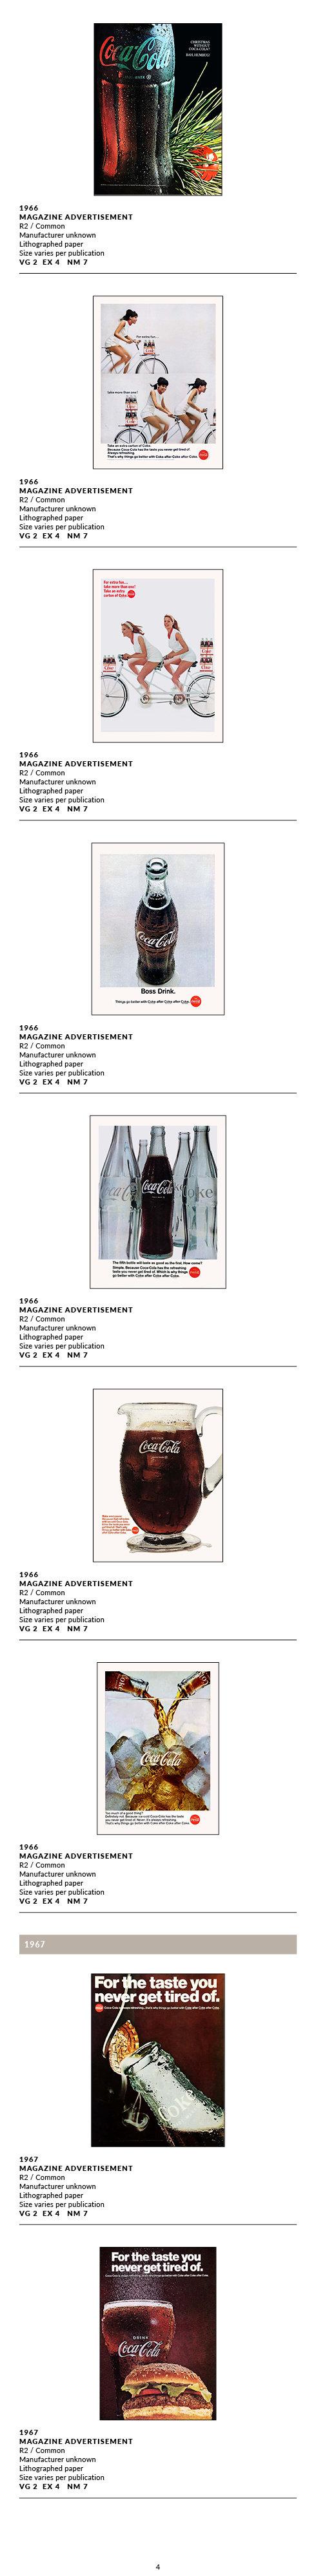 Desktop 1965-69 Ads Master4.jpg